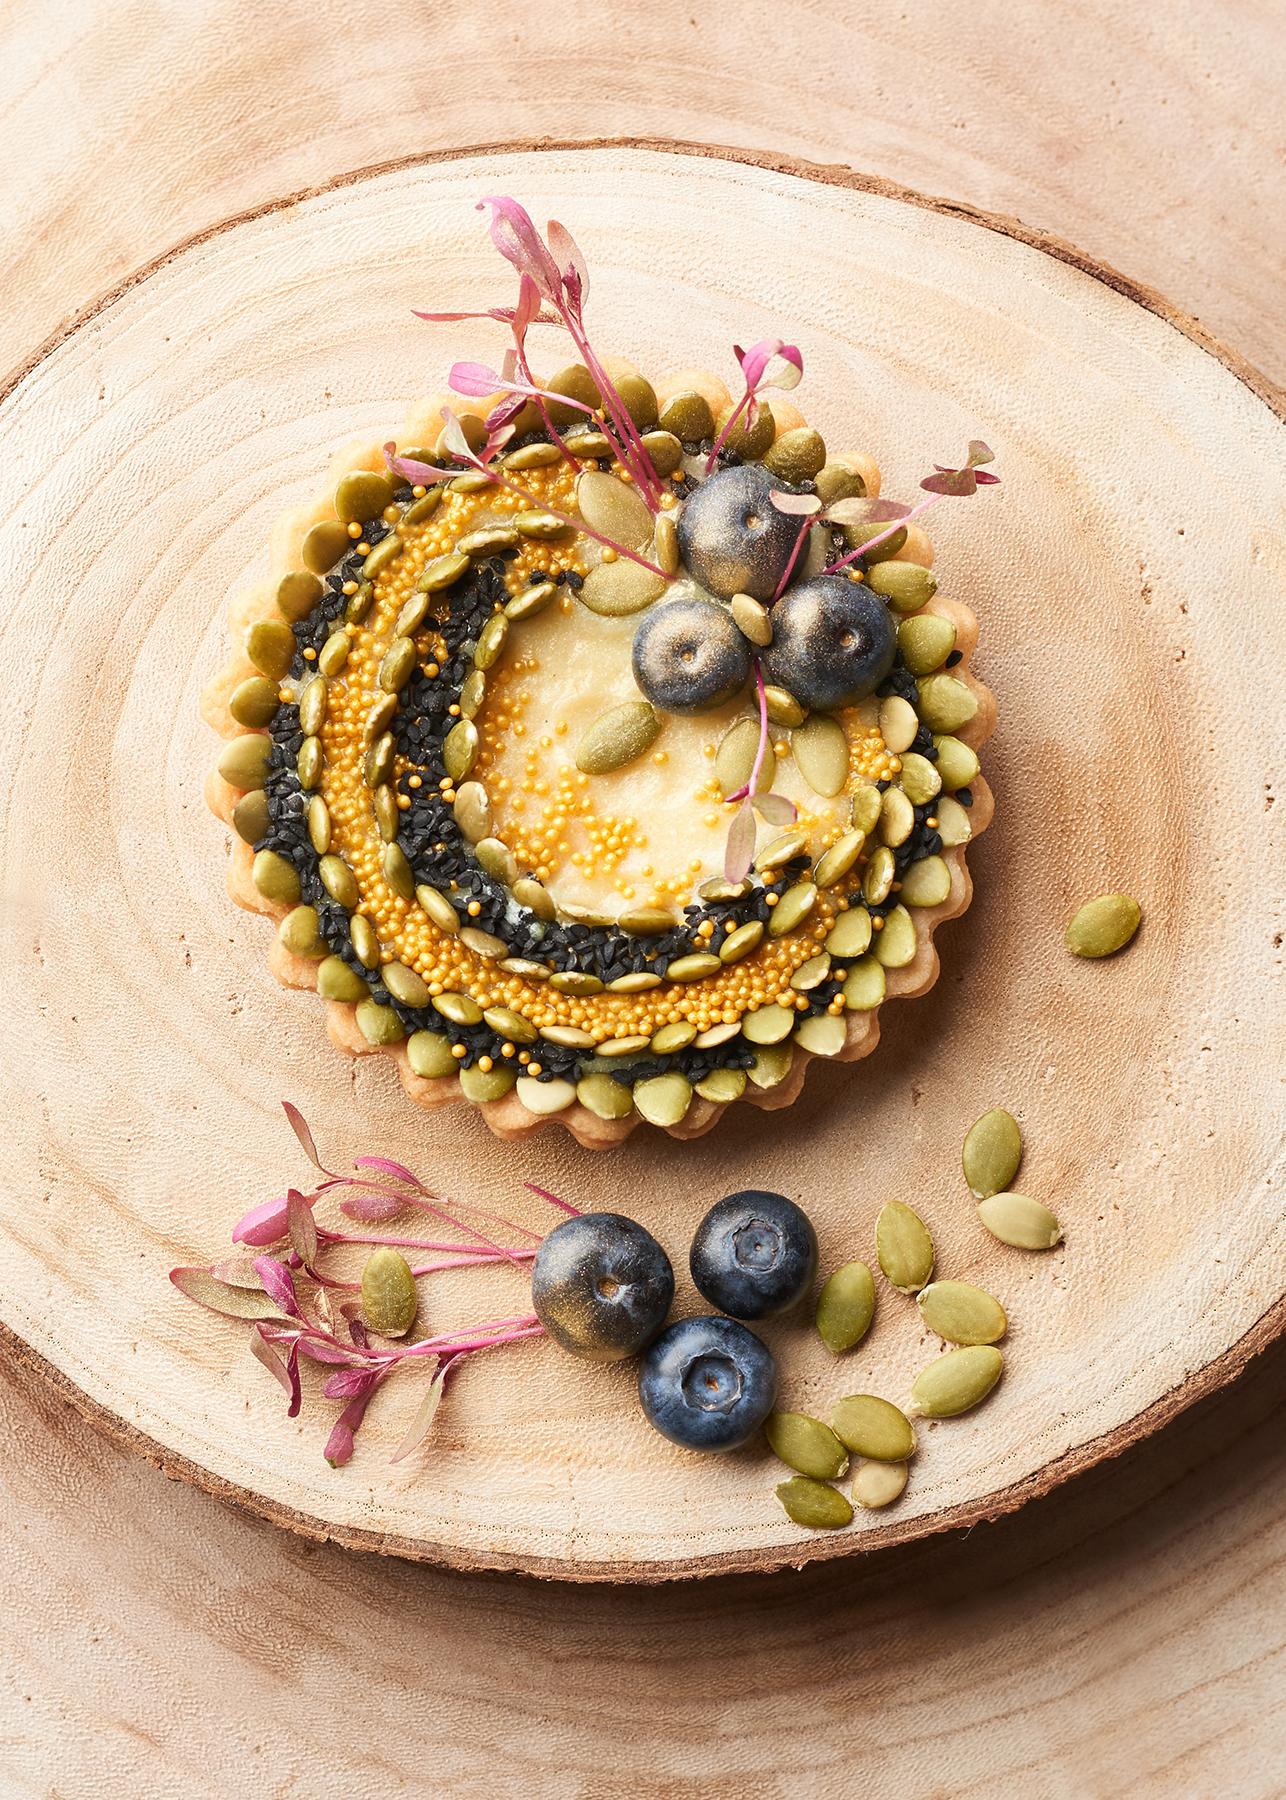 Vegan custard tart with blueberries